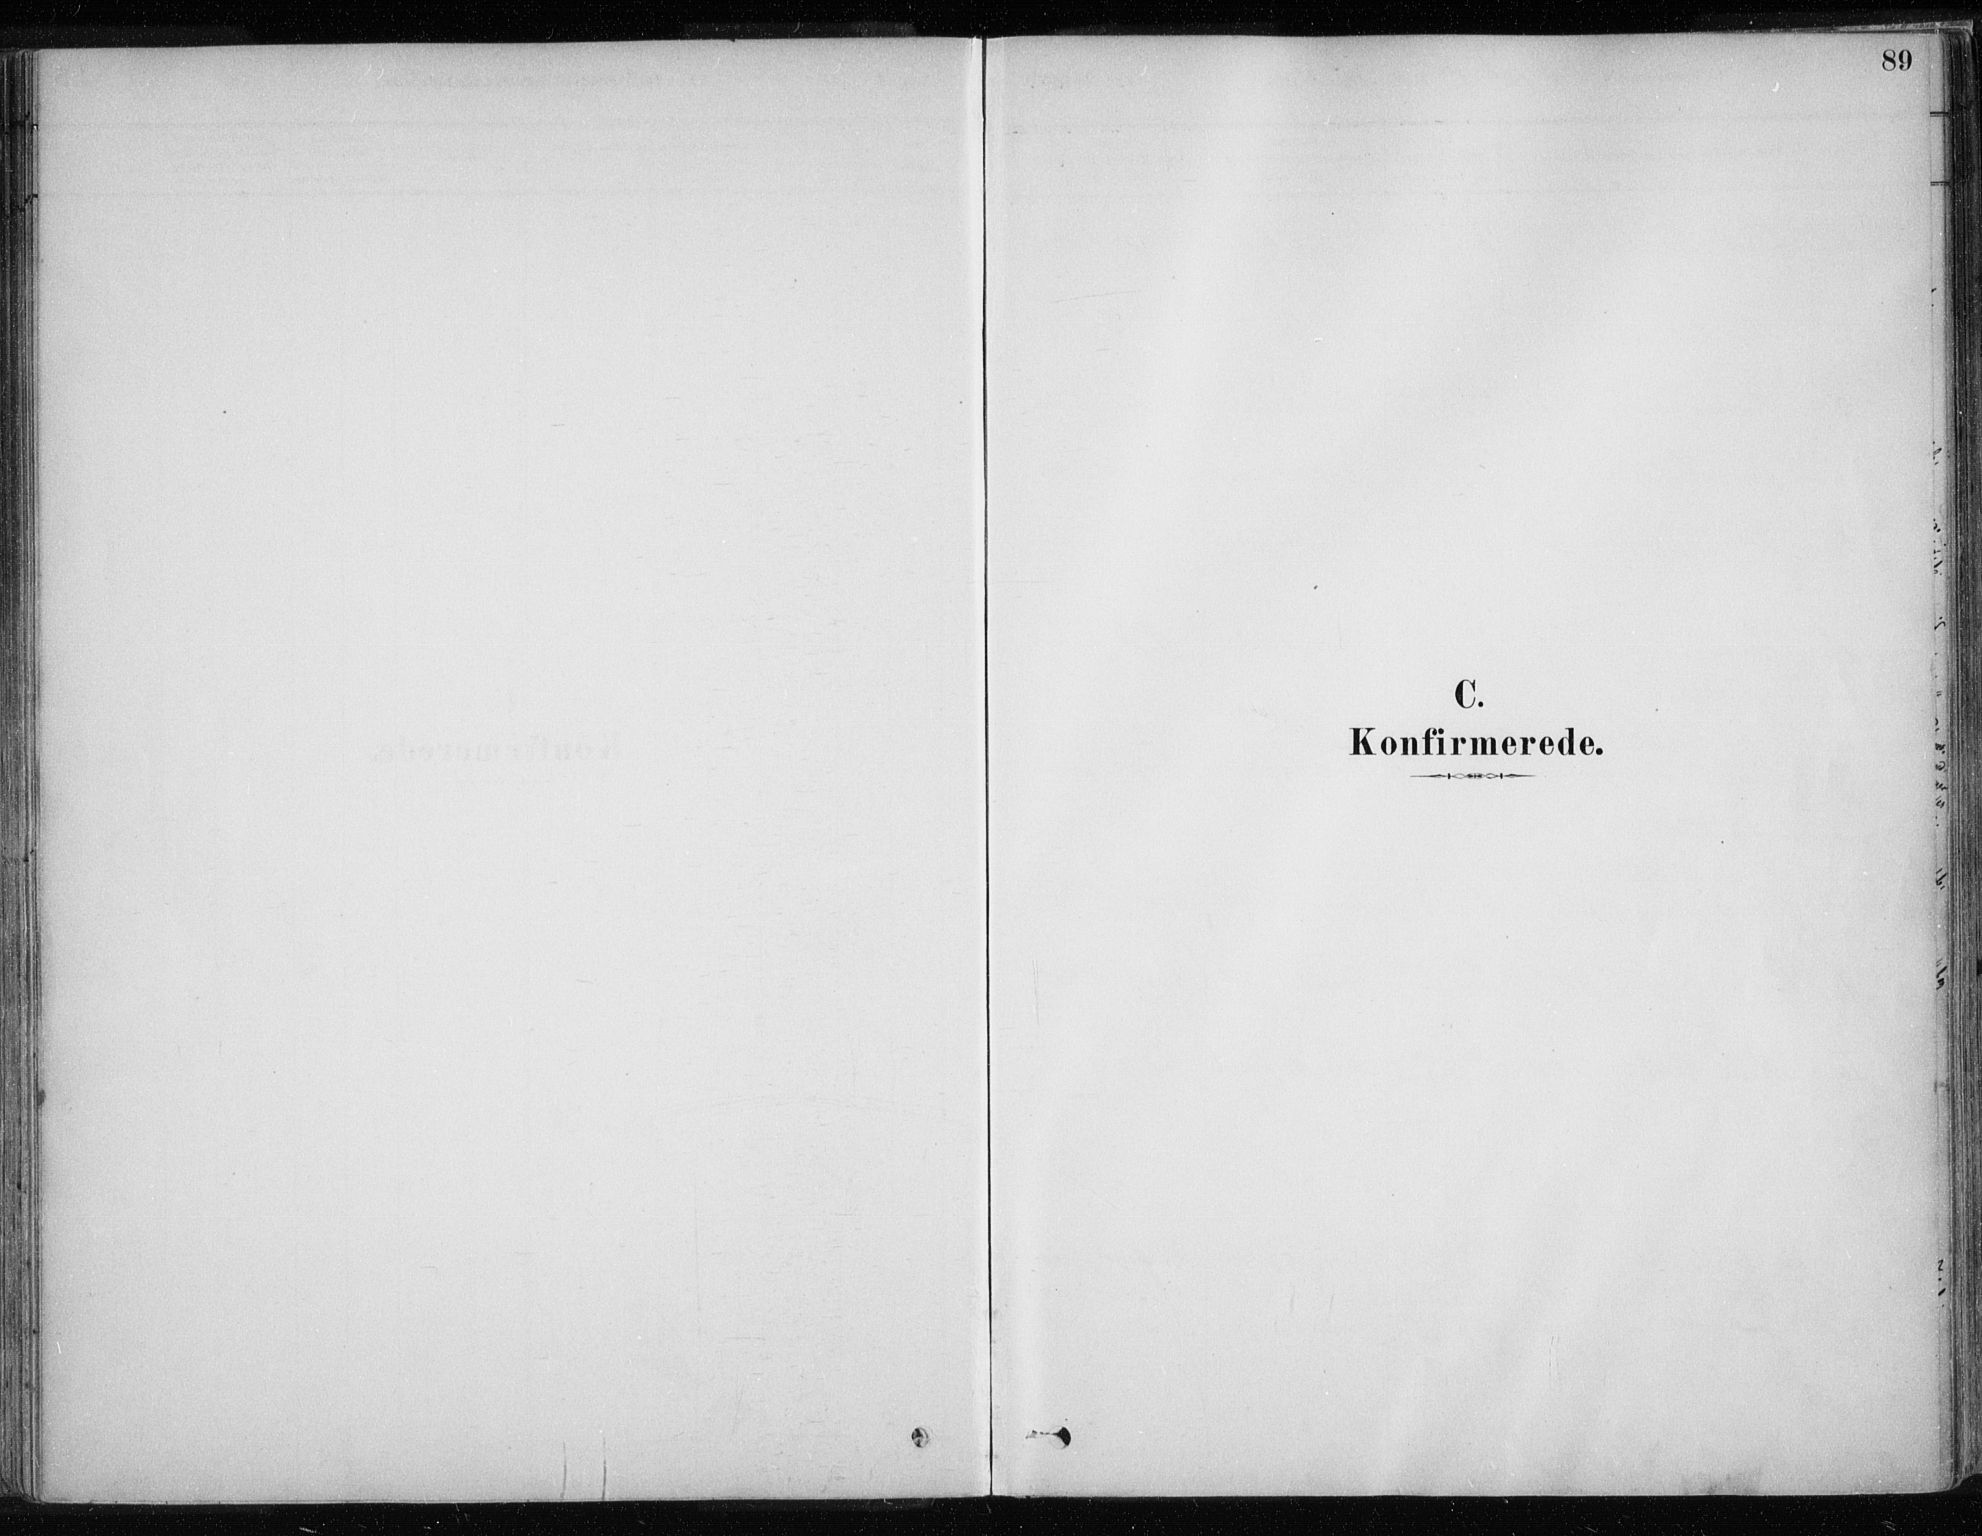 SATØ, Karasjok sokneprestkontor, H/Ha/L0002kirke: Ministerialbok nr. 2, 1885-1906, s. 89